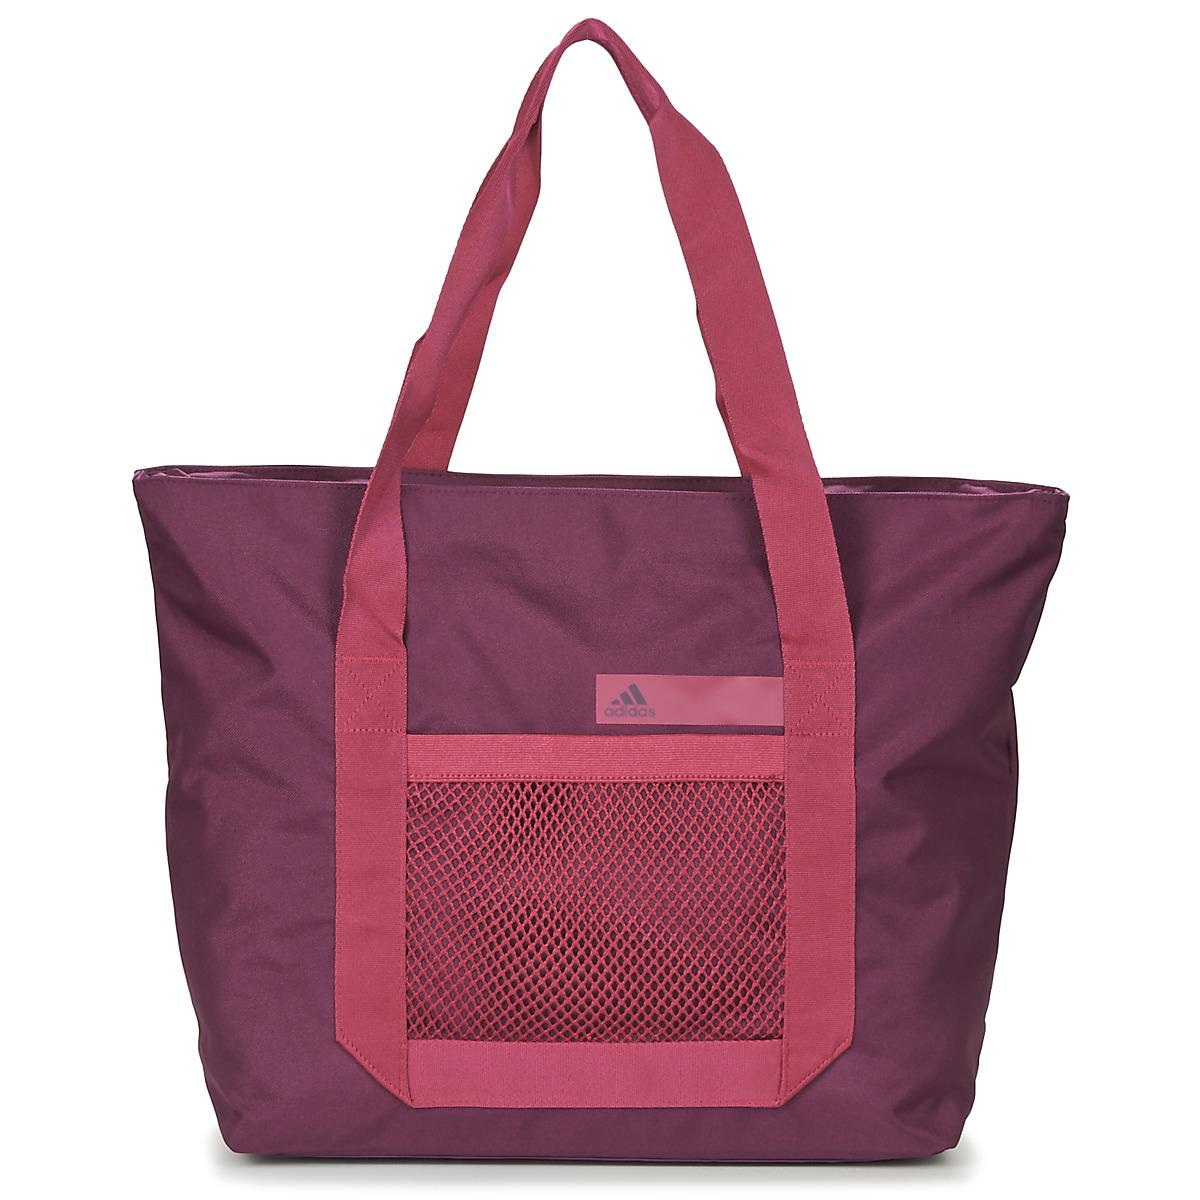 60903c6c62 adidas Good Tote Sol Women s Shopper Bag In Purple in Purple - Lyst